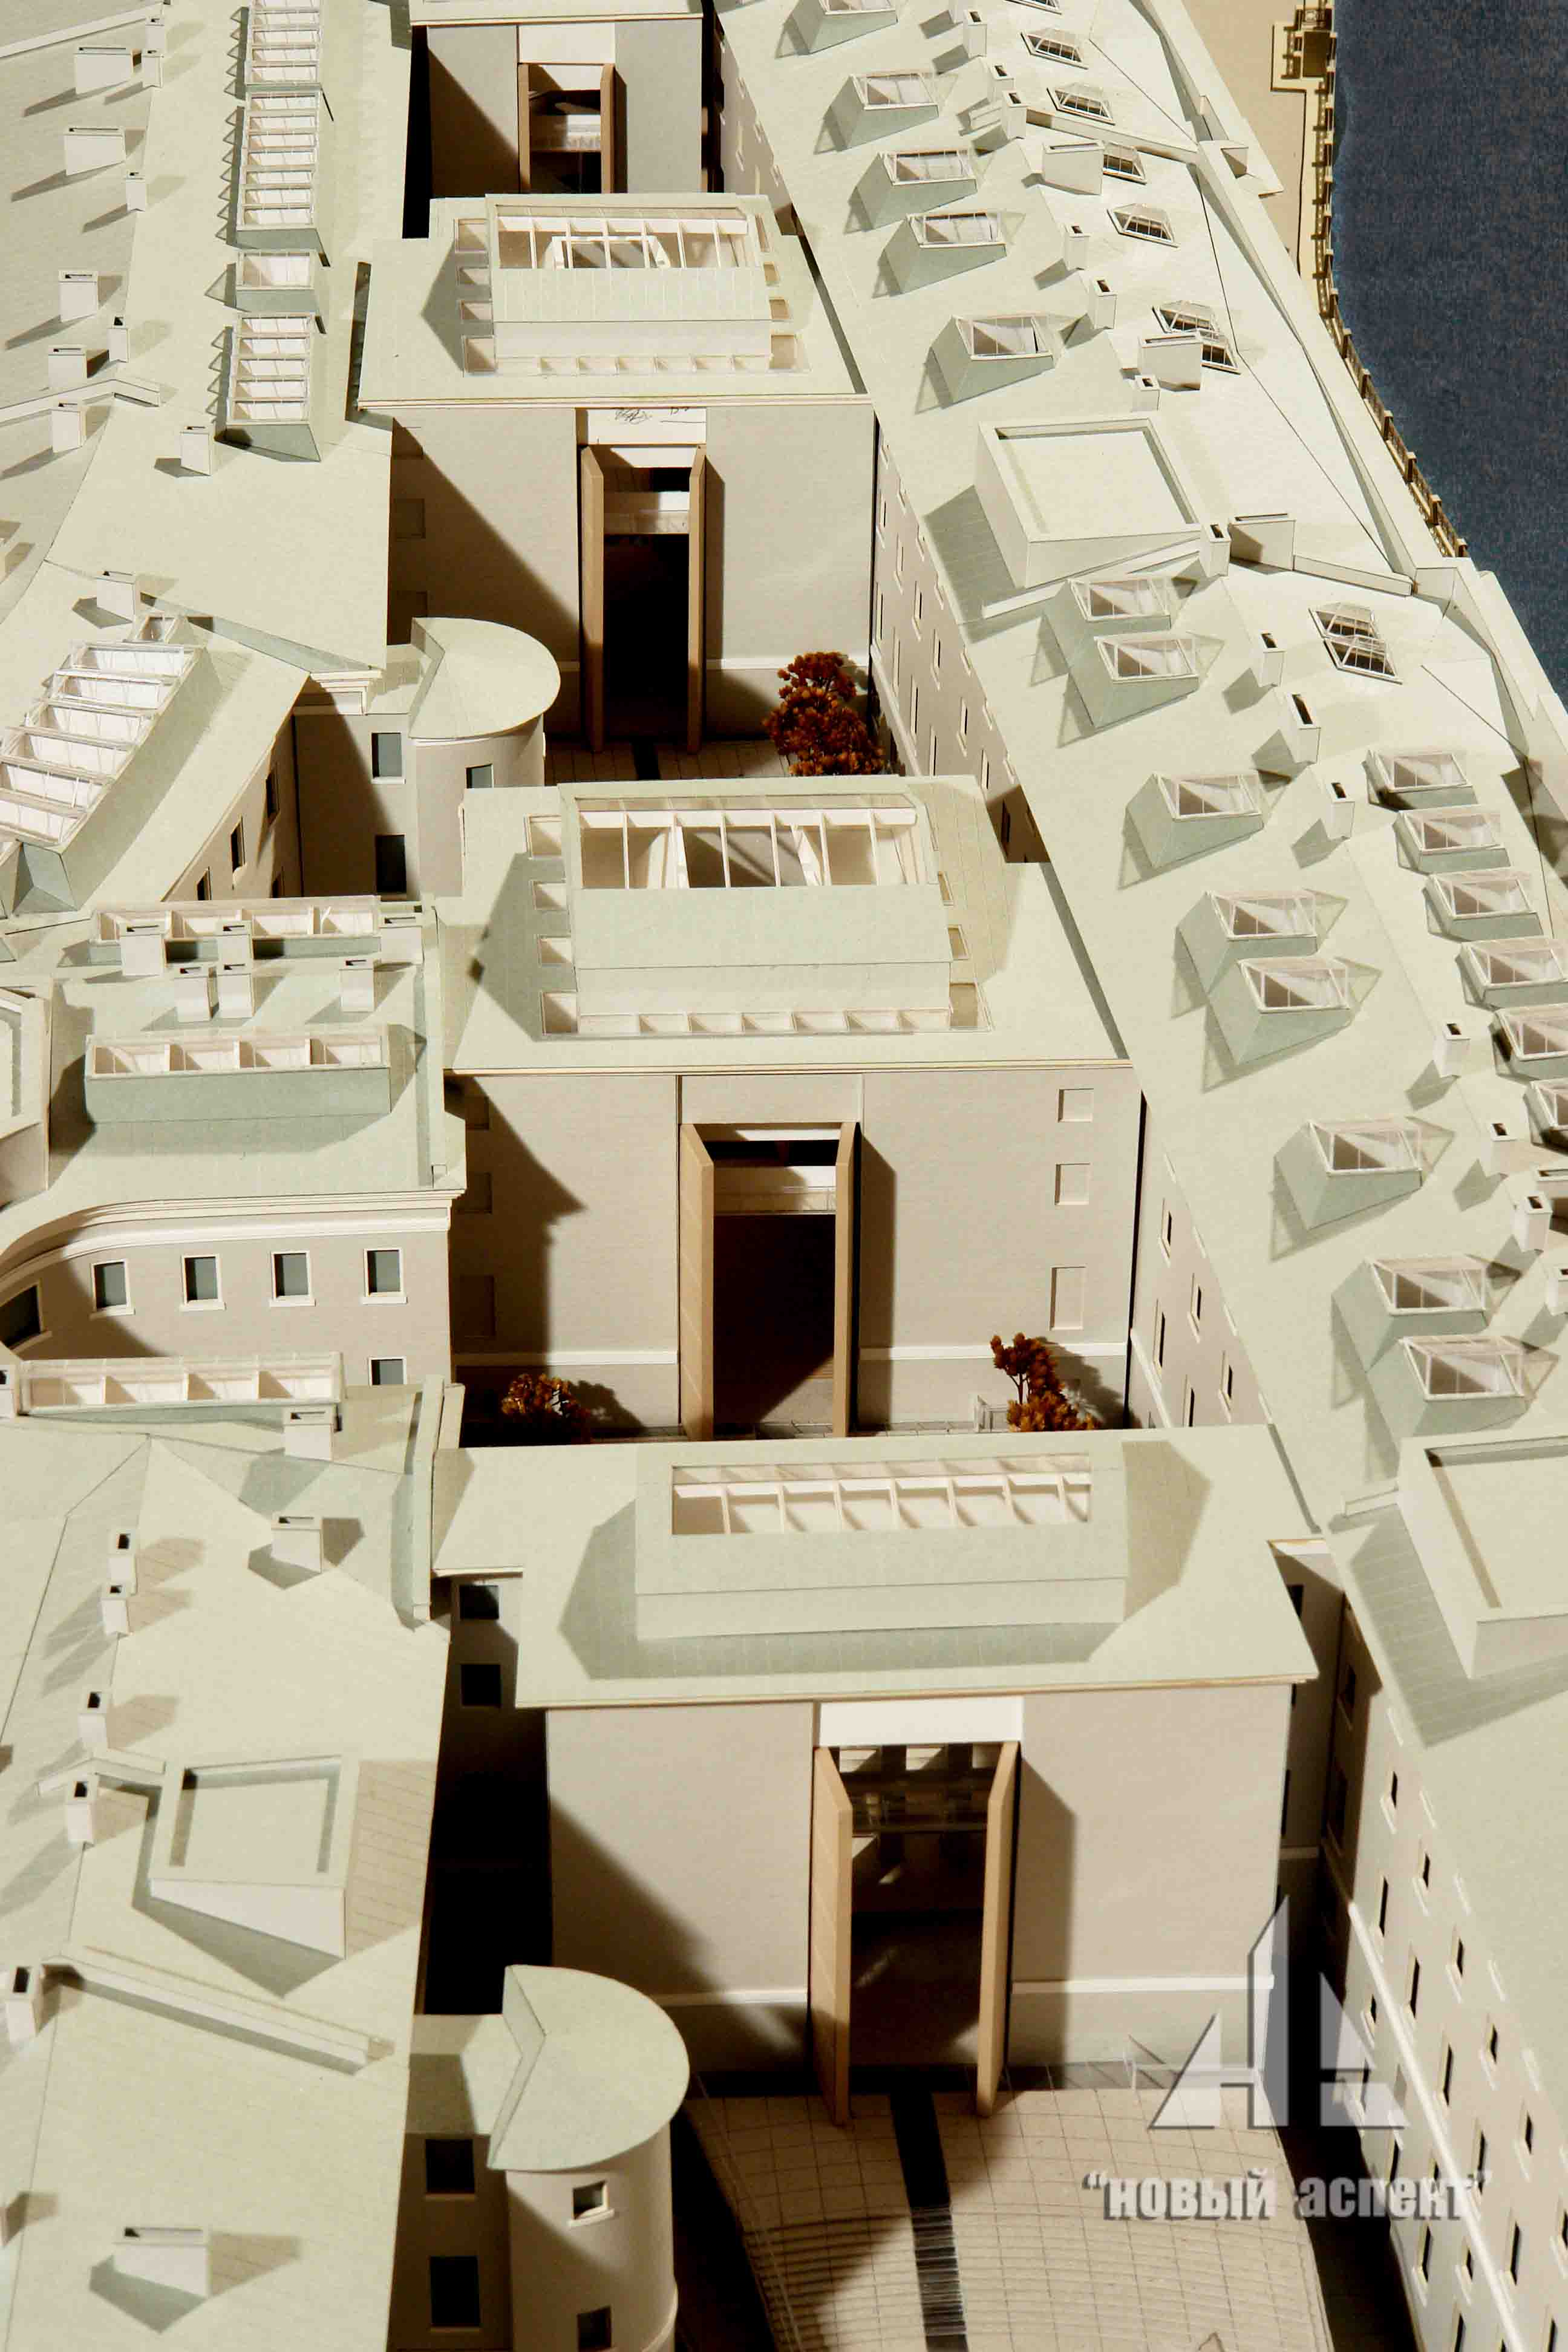 Макеты общественных зданий, ГЛШ (2)